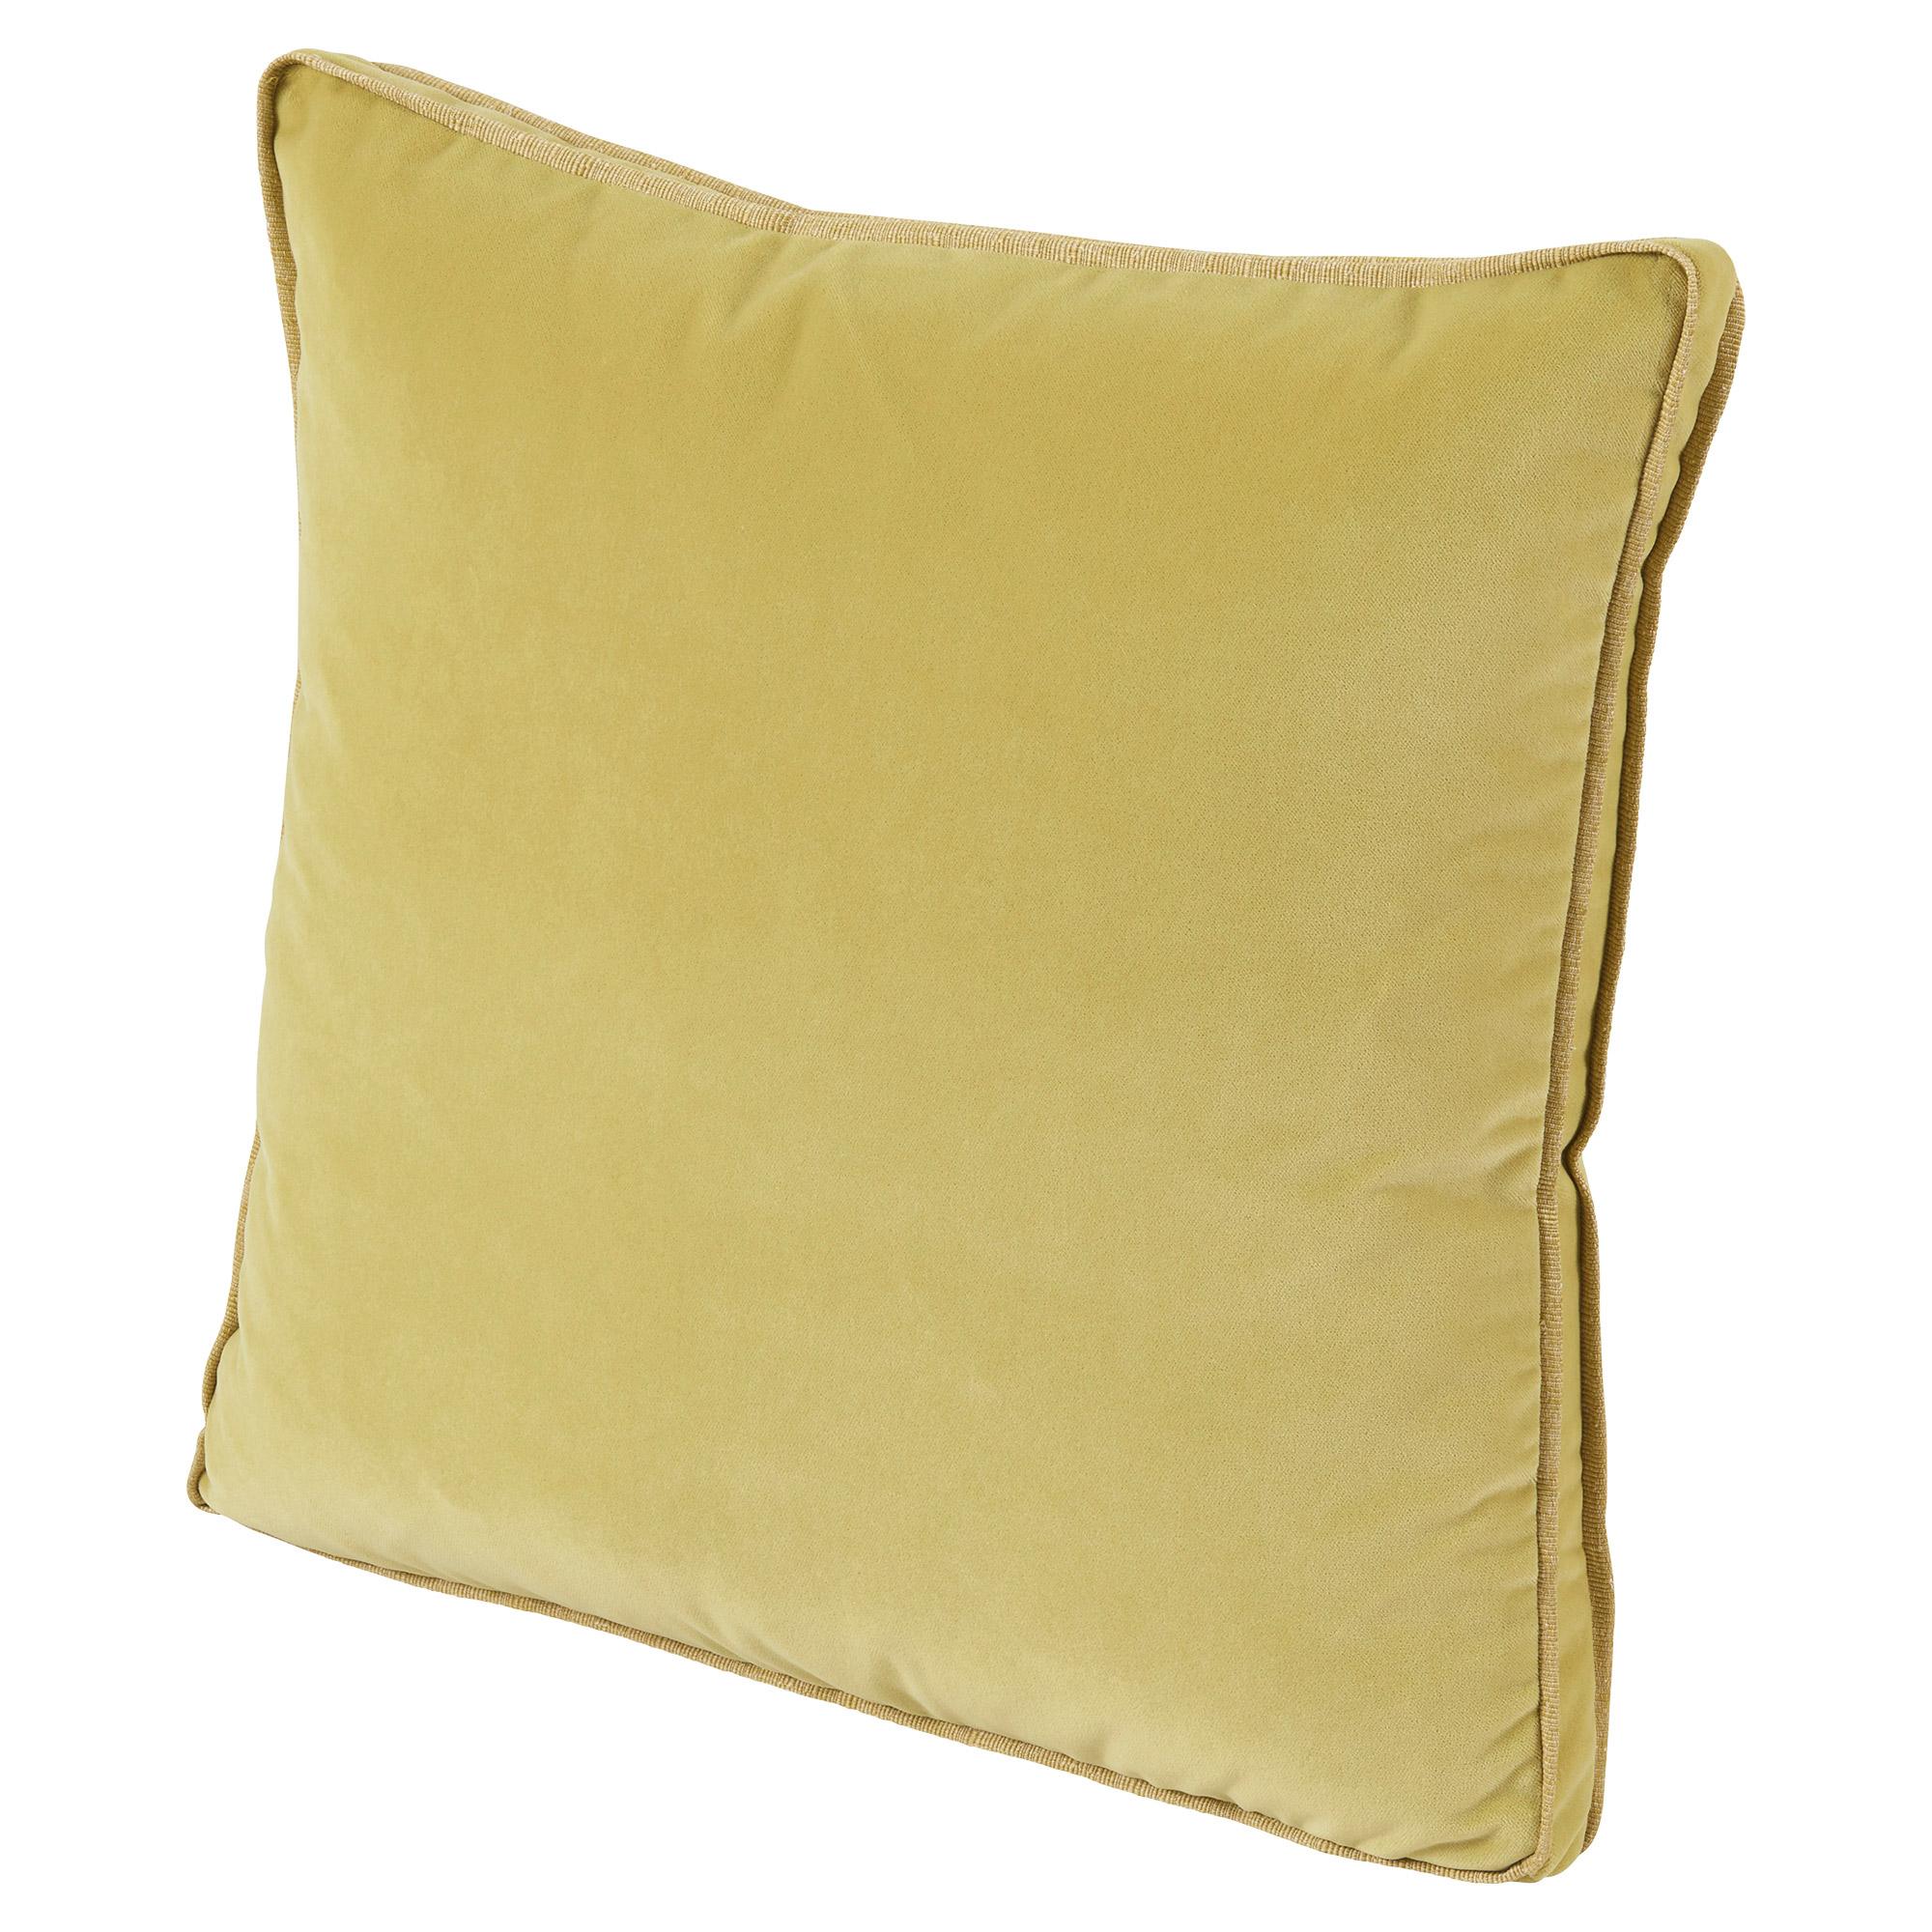 Tildy Classic Citrus Yellow Velvet Pillow - 22x22